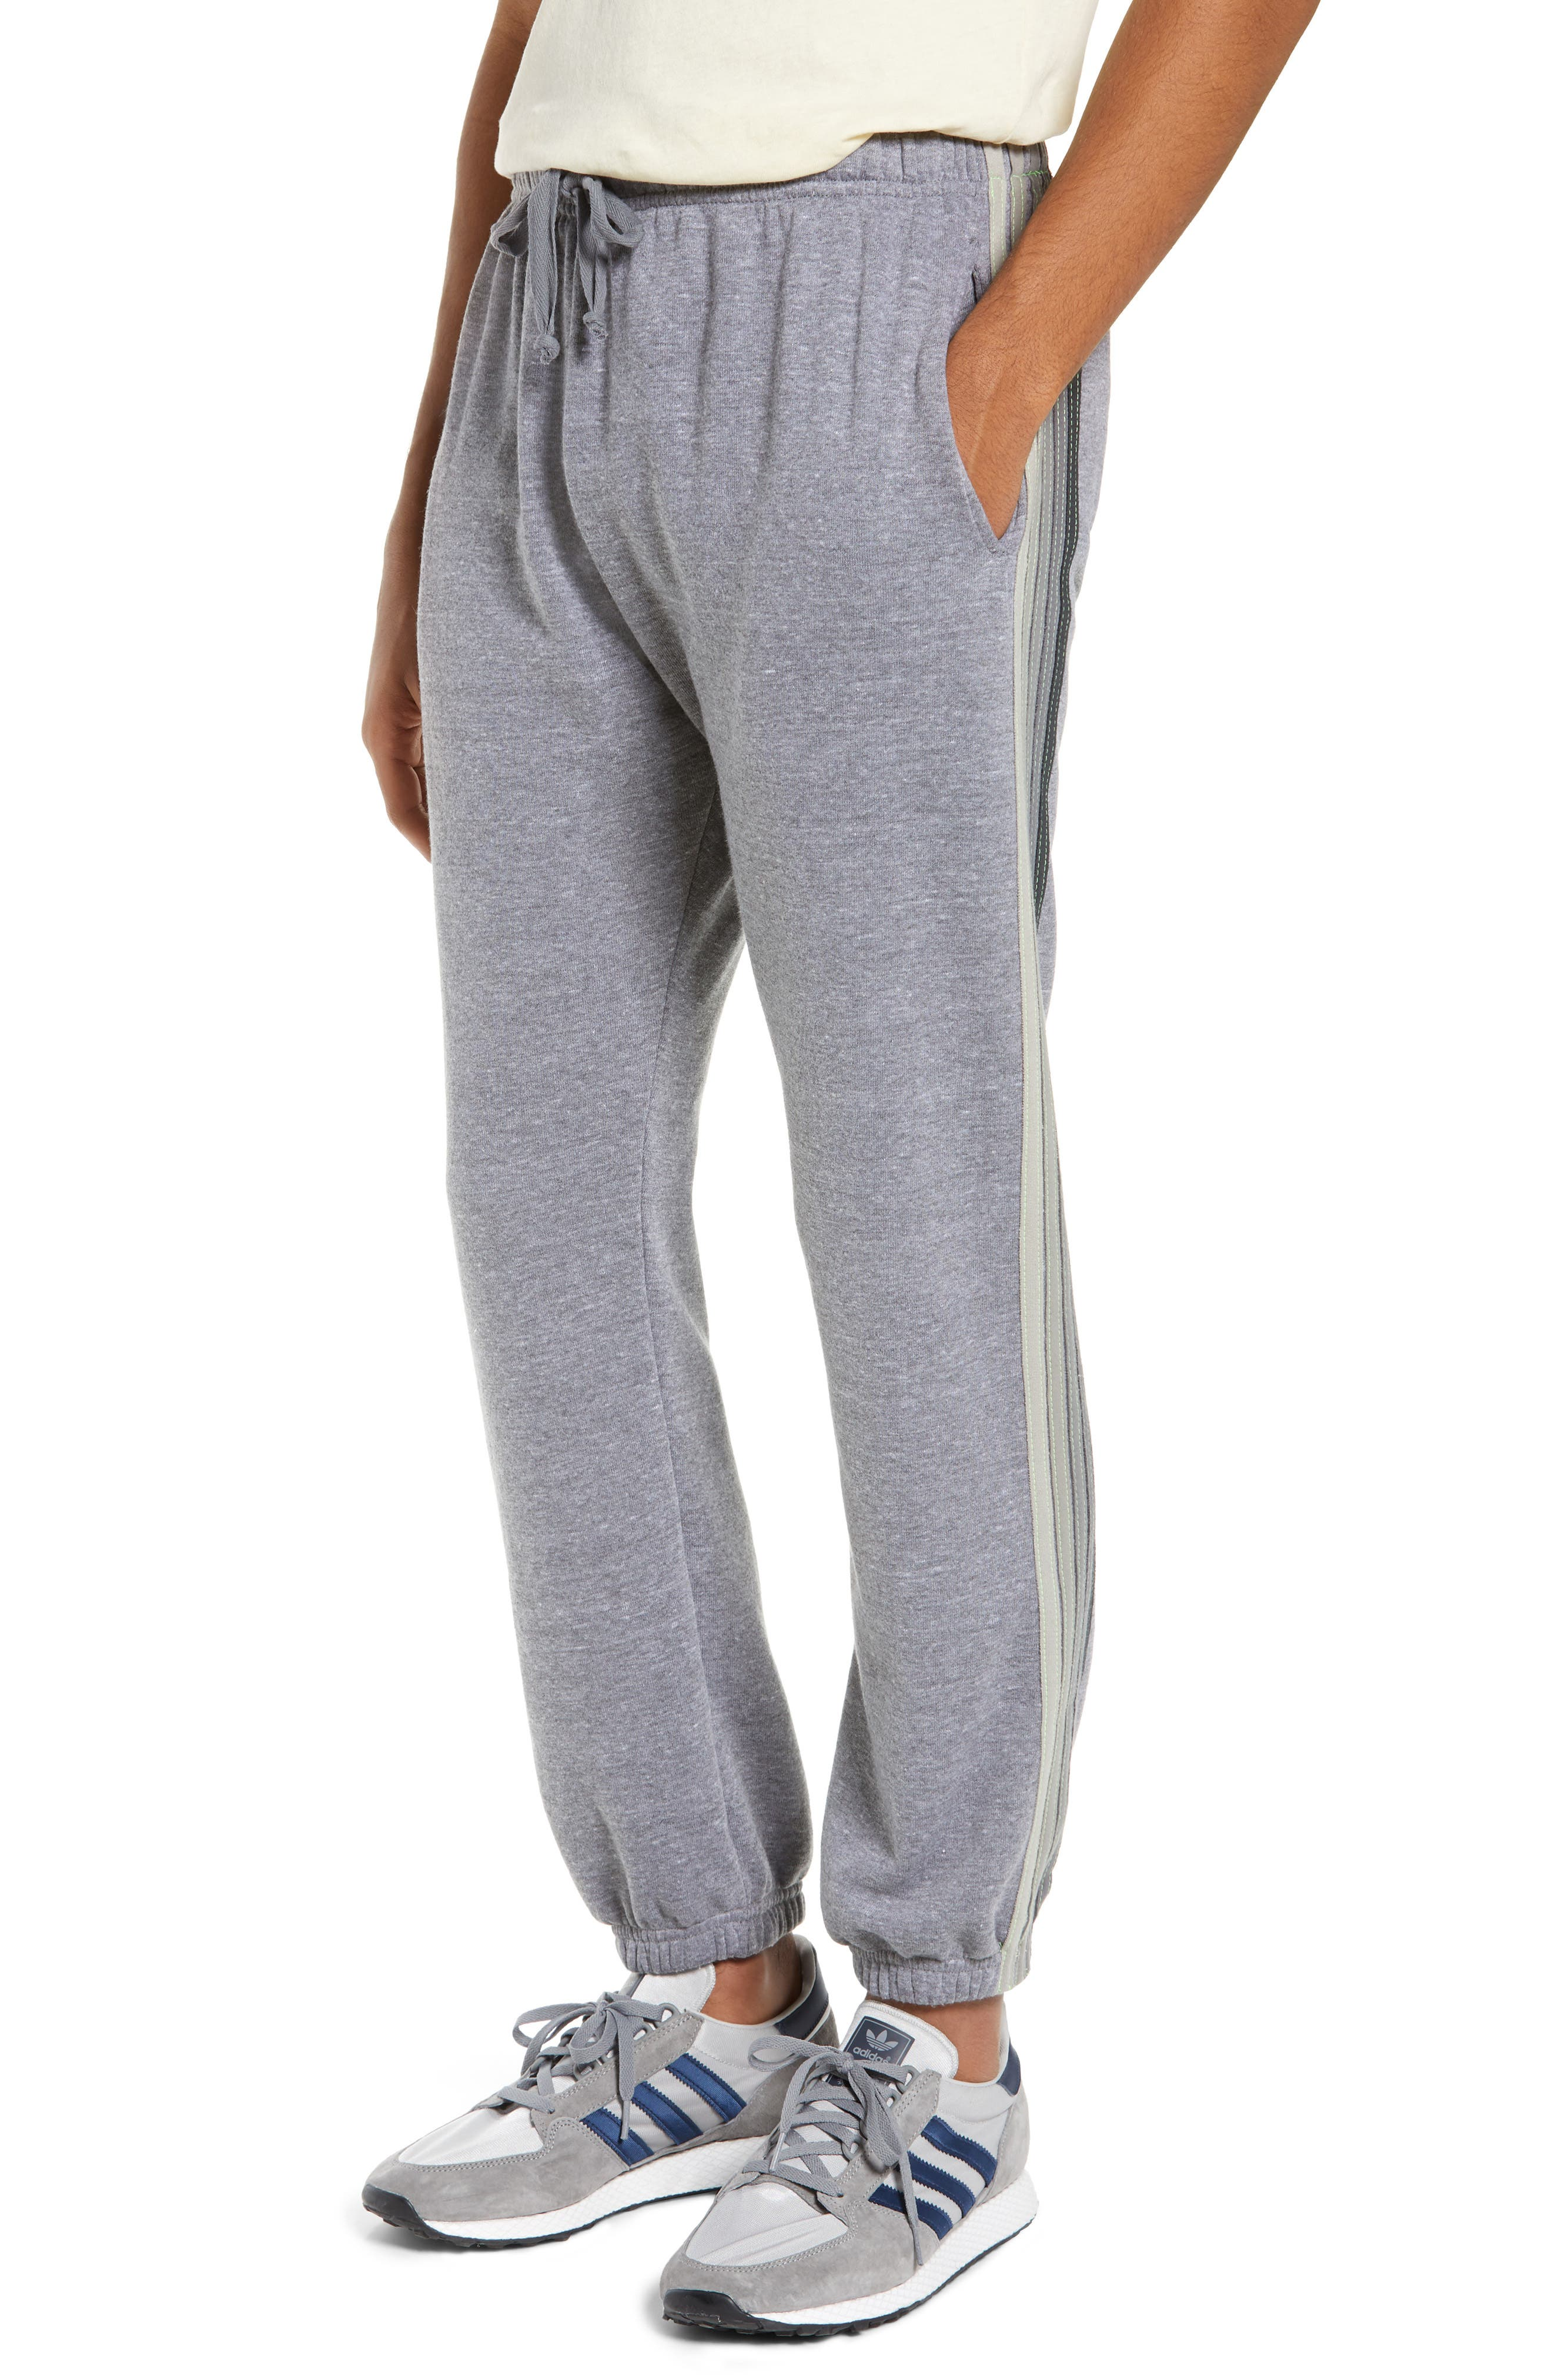 Aviator Nation 5-Stripe Slim Fit Sweatpants, Grey